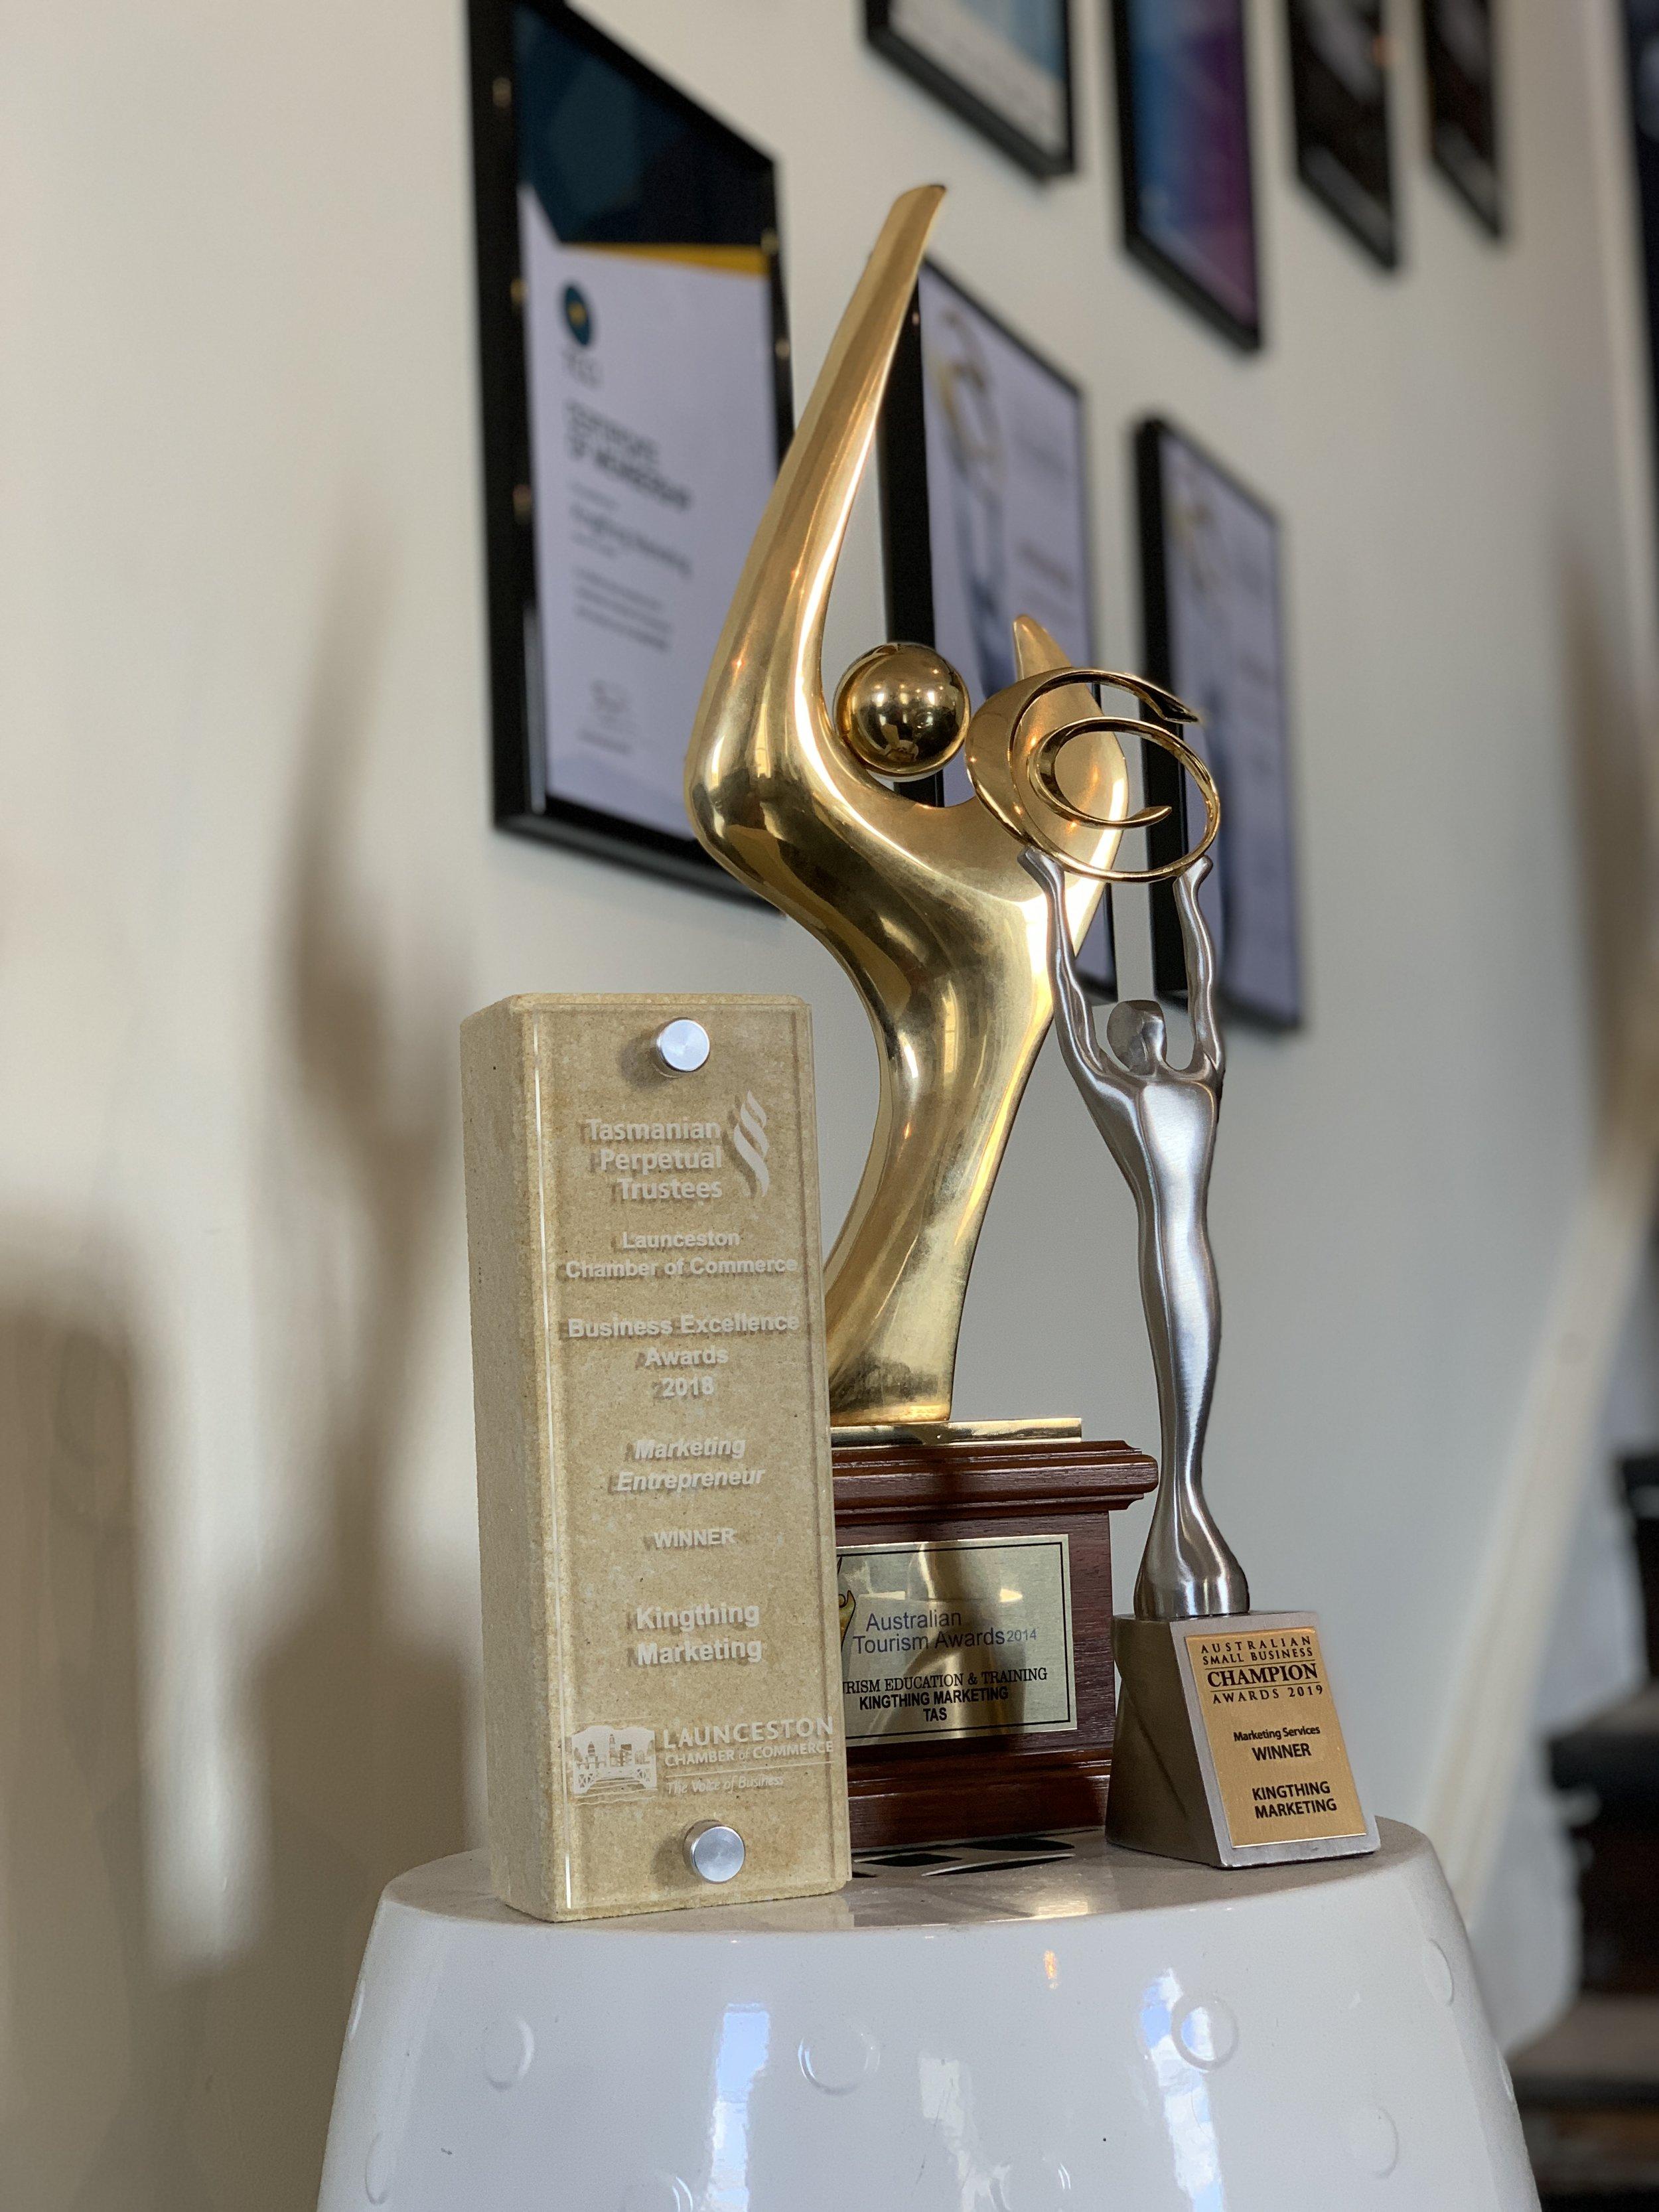 Kingthing launceston website awards and trophies